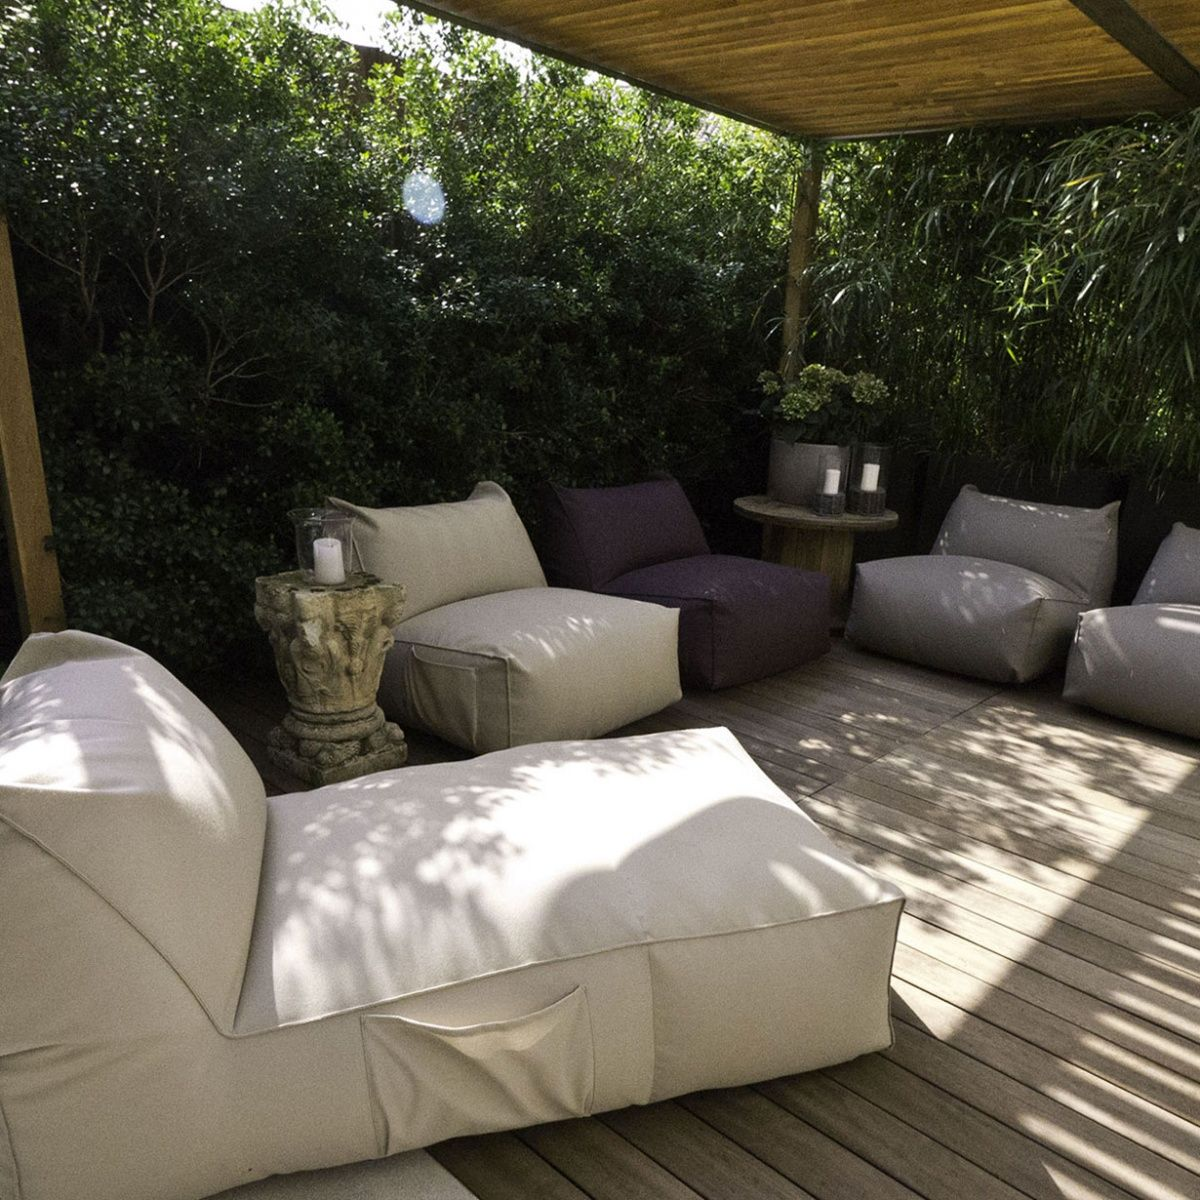 Easy Chair White By Puffone Gart Bali House Cozy Decor Interior Design Inspiration